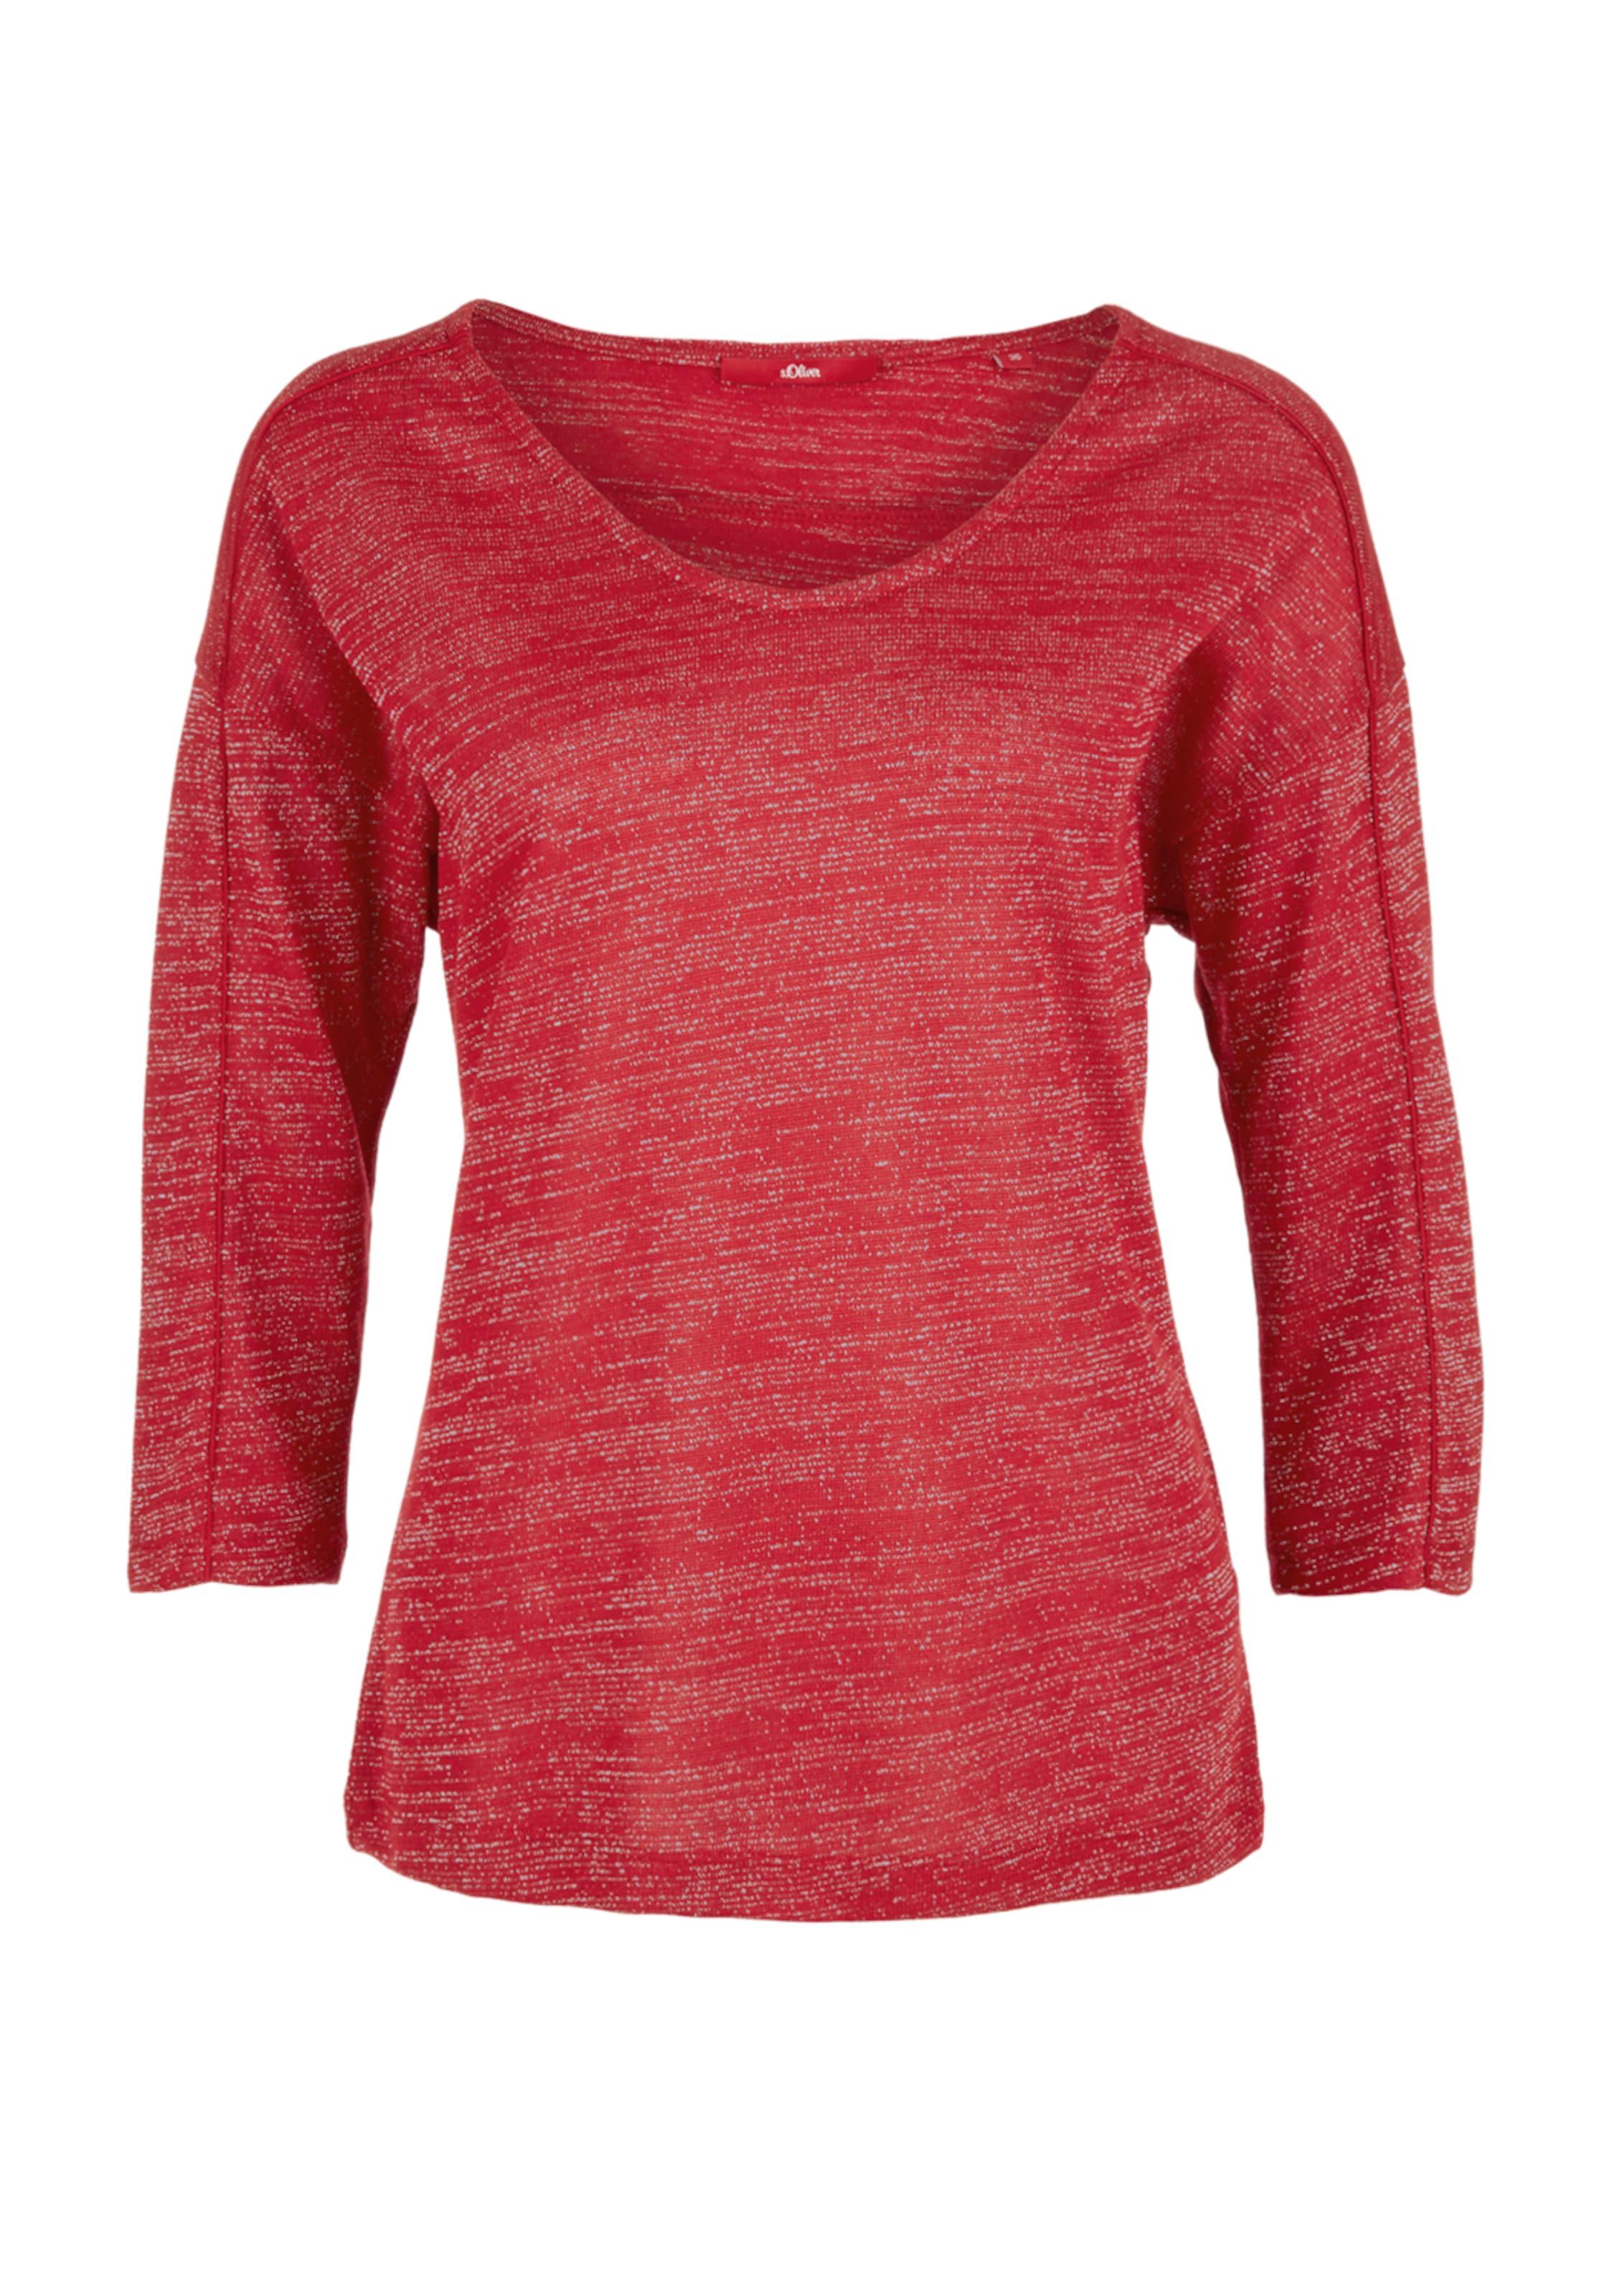 FeuerrotSilber Shirt In S oliver S 0wOk8nP